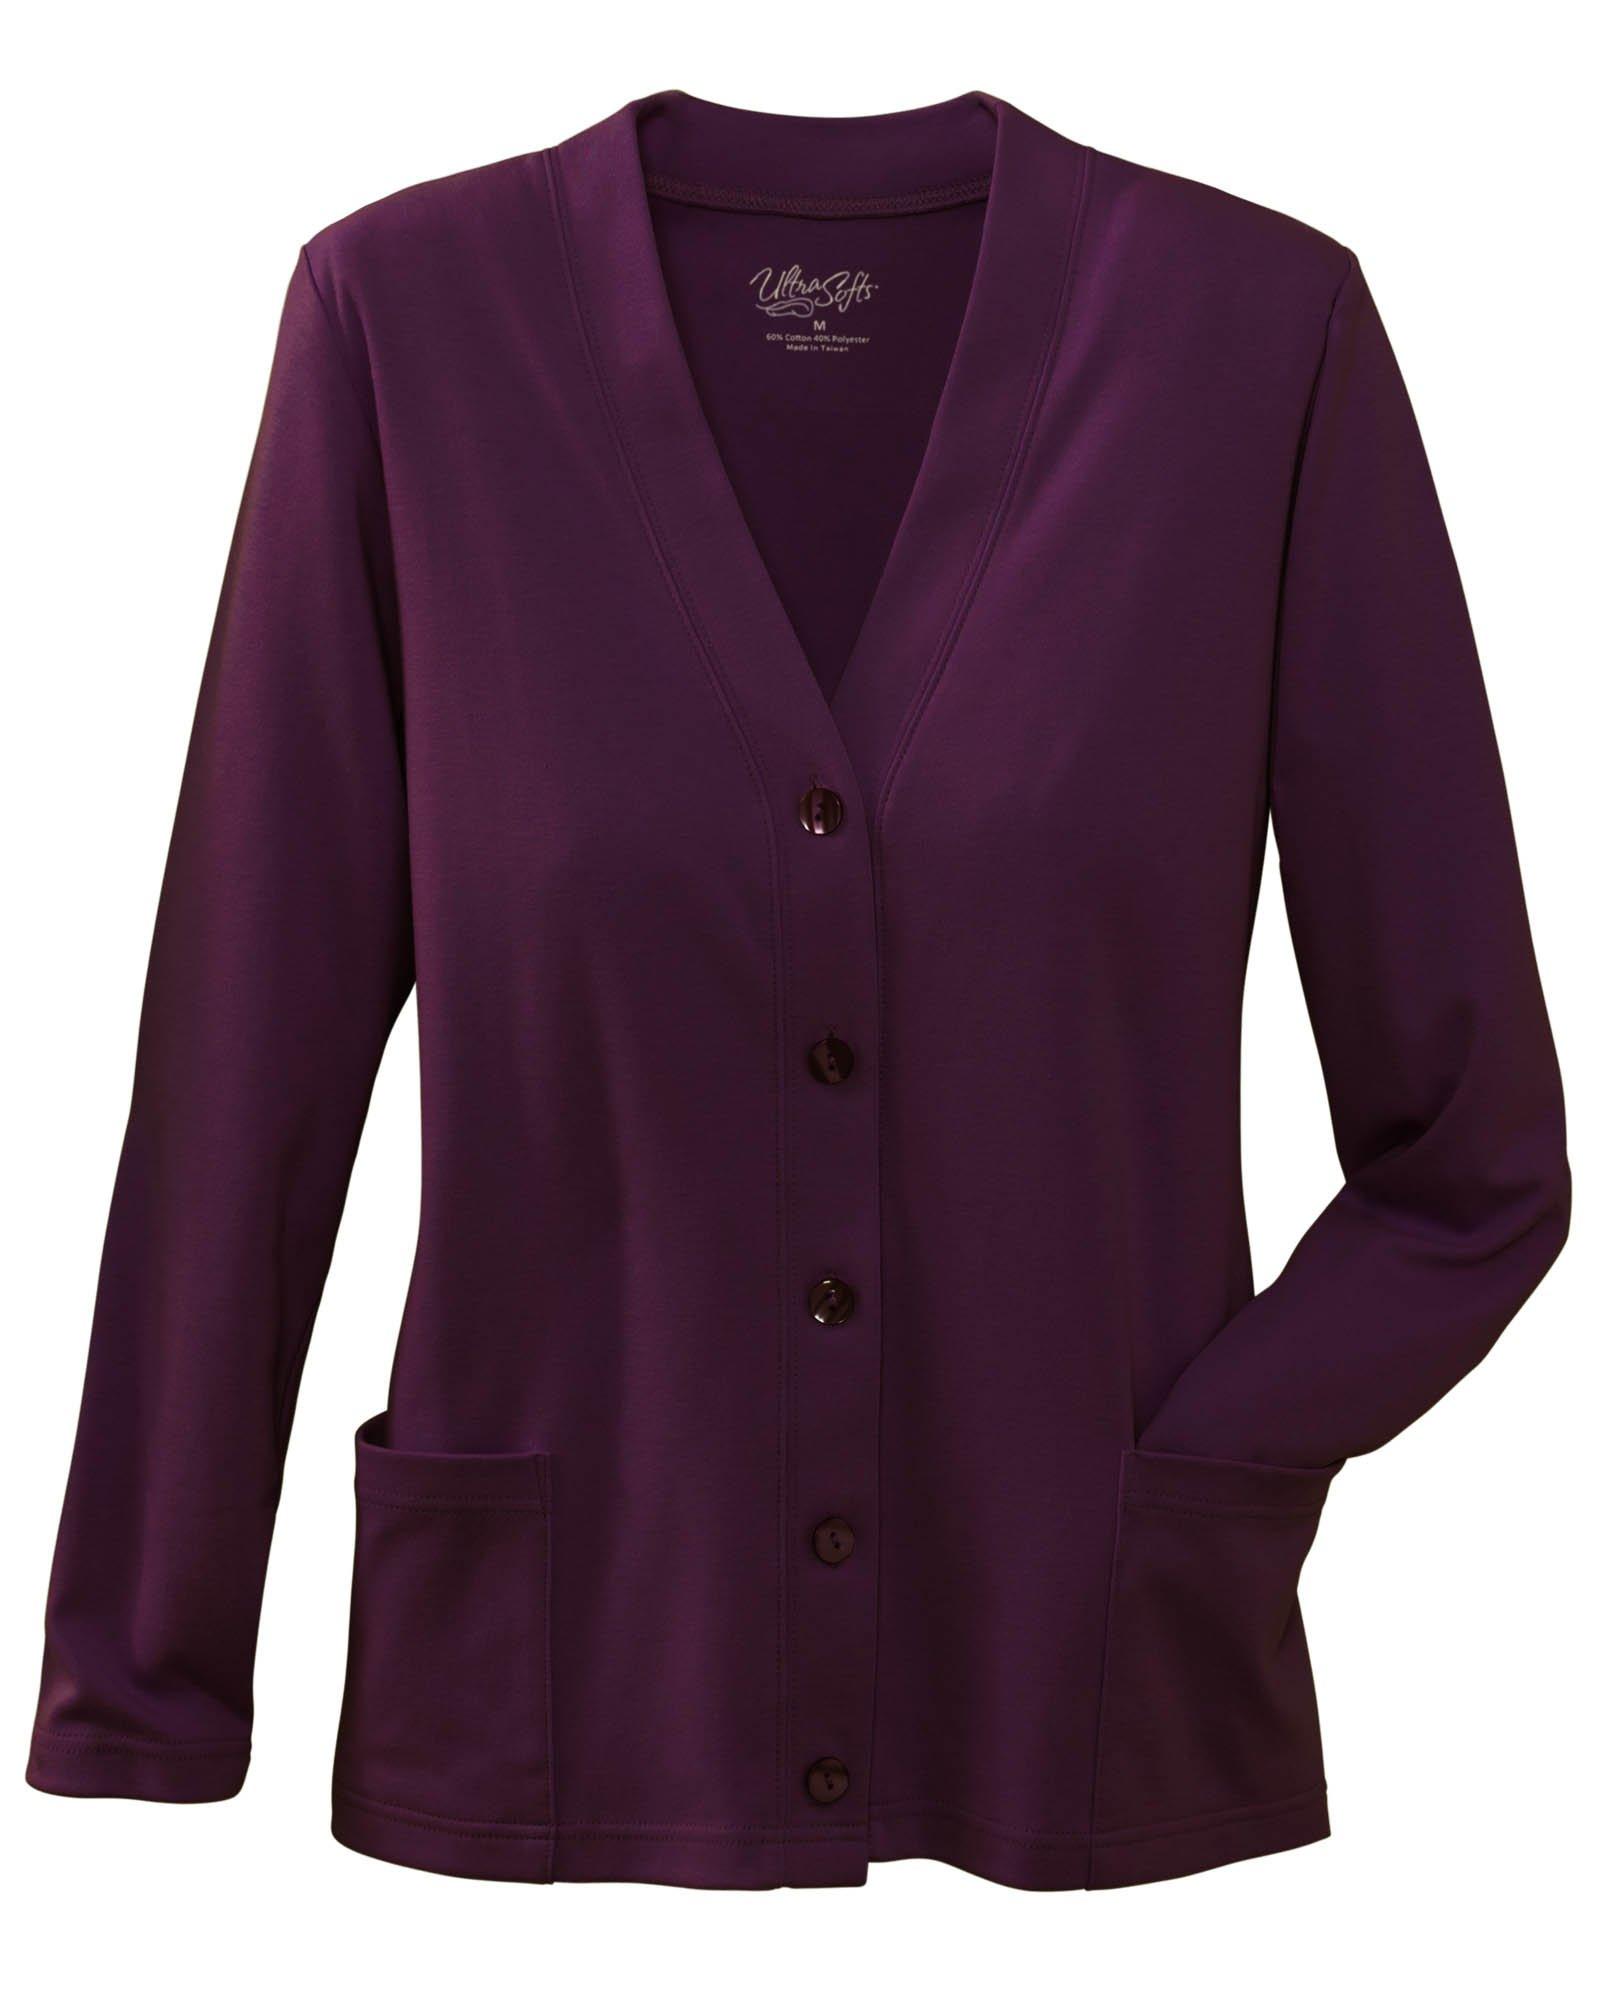 UltraSofts Button-Front Knit Cardigan, Purple, Petite Large